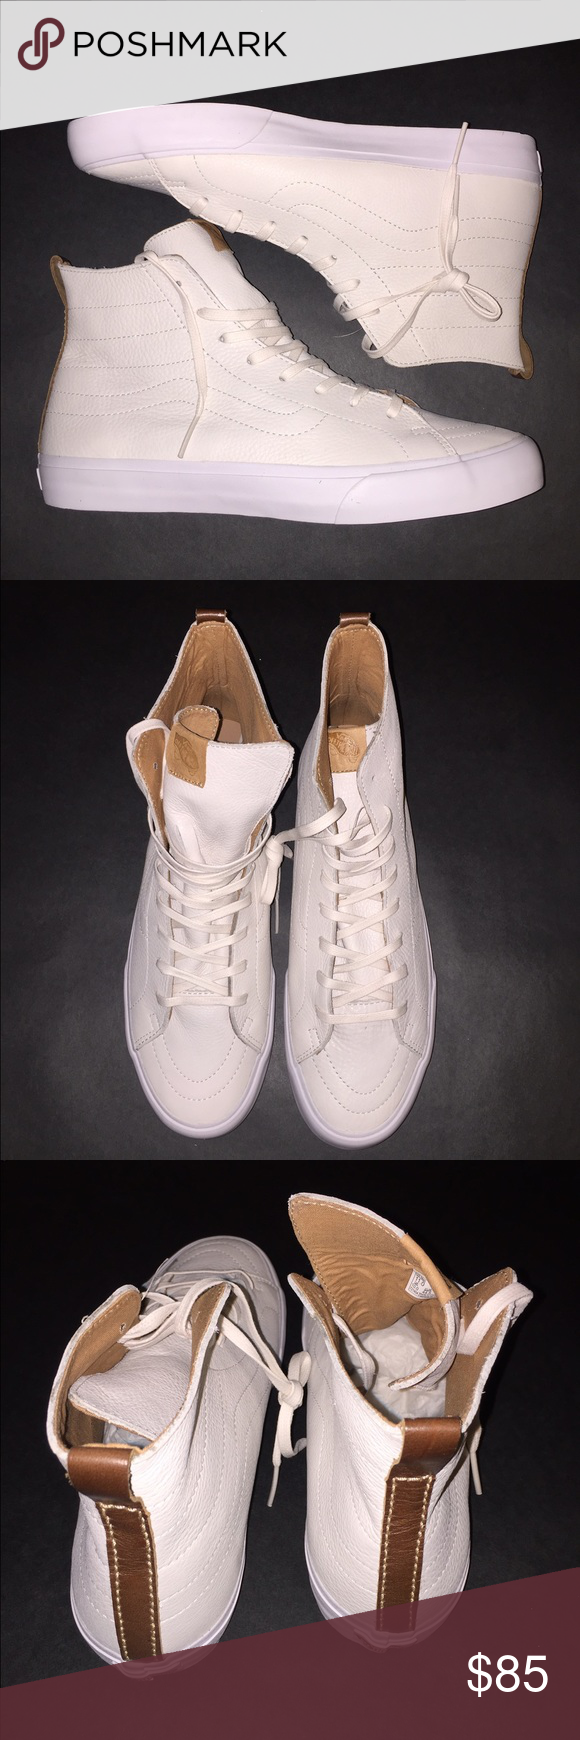 7f9e0081dcb106 Vans sk8 hi winter white size 11 Brand new sk8 hi Vans Shoes Sneakers